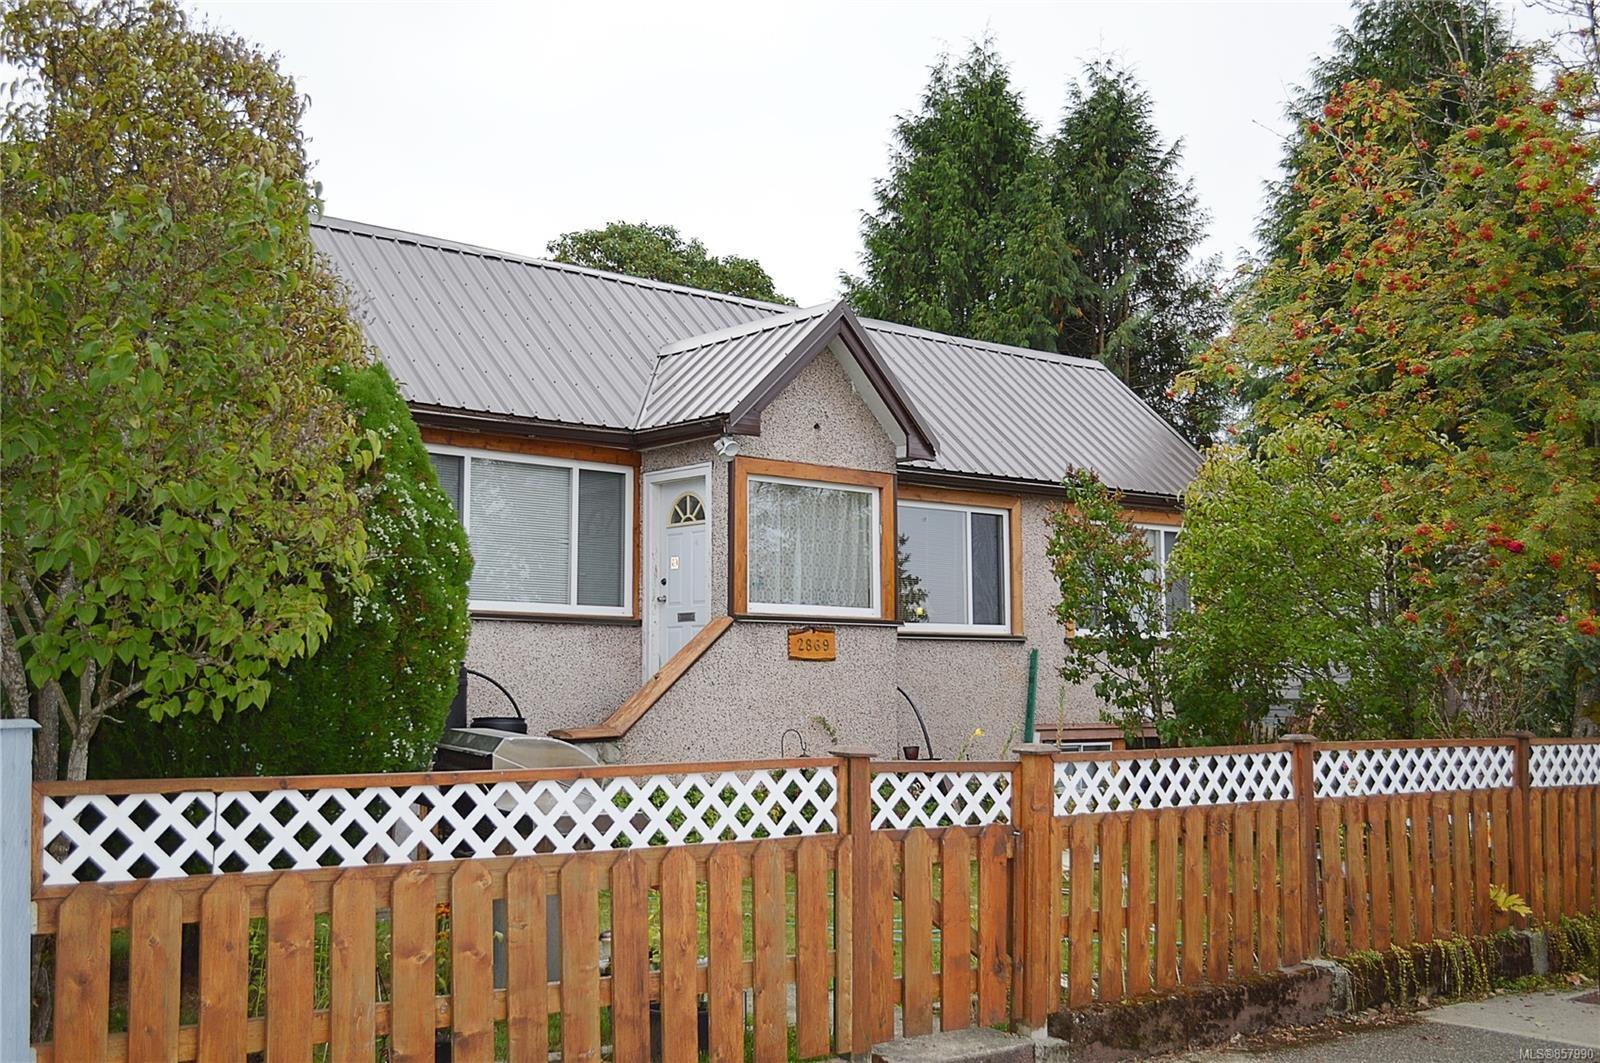 Main Photo: 2869 9th Ave in : PA Port Alberni House for sale (Port Alberni)  : MLS®# 857990